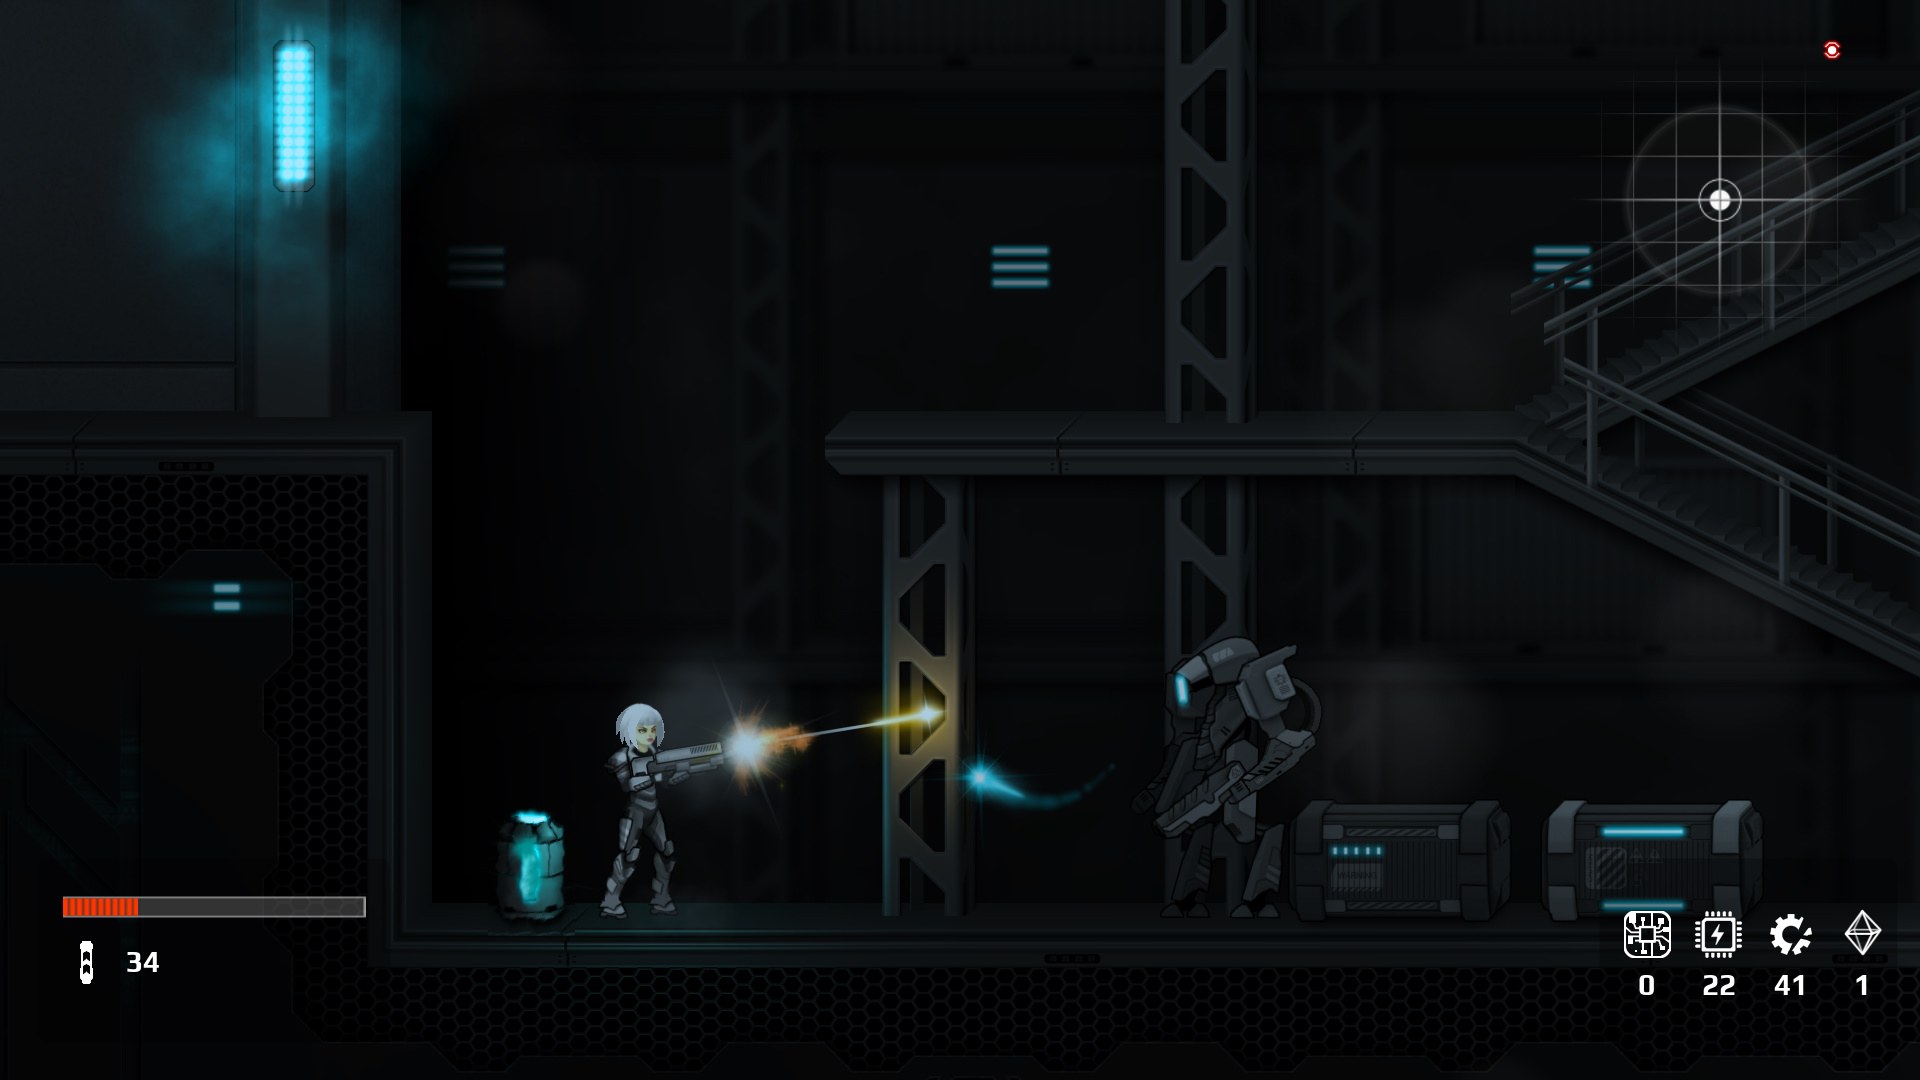 Smelted Kin: Inhuman Impact #5 | Smelted Kin: Inhuman Impact [экшен-платформер]